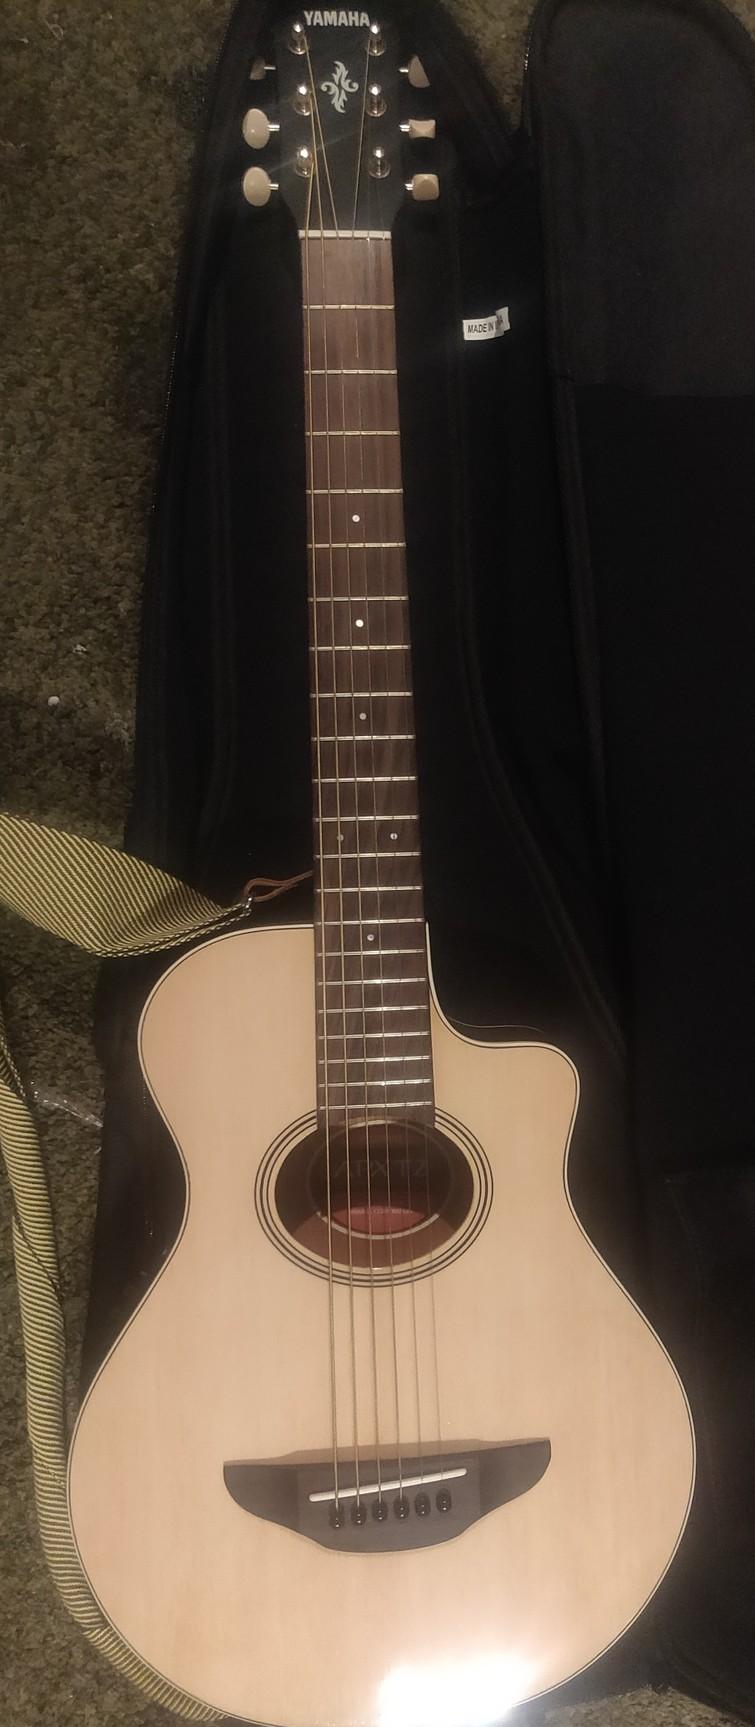 Elektr- akoestische Yamaha gitaar